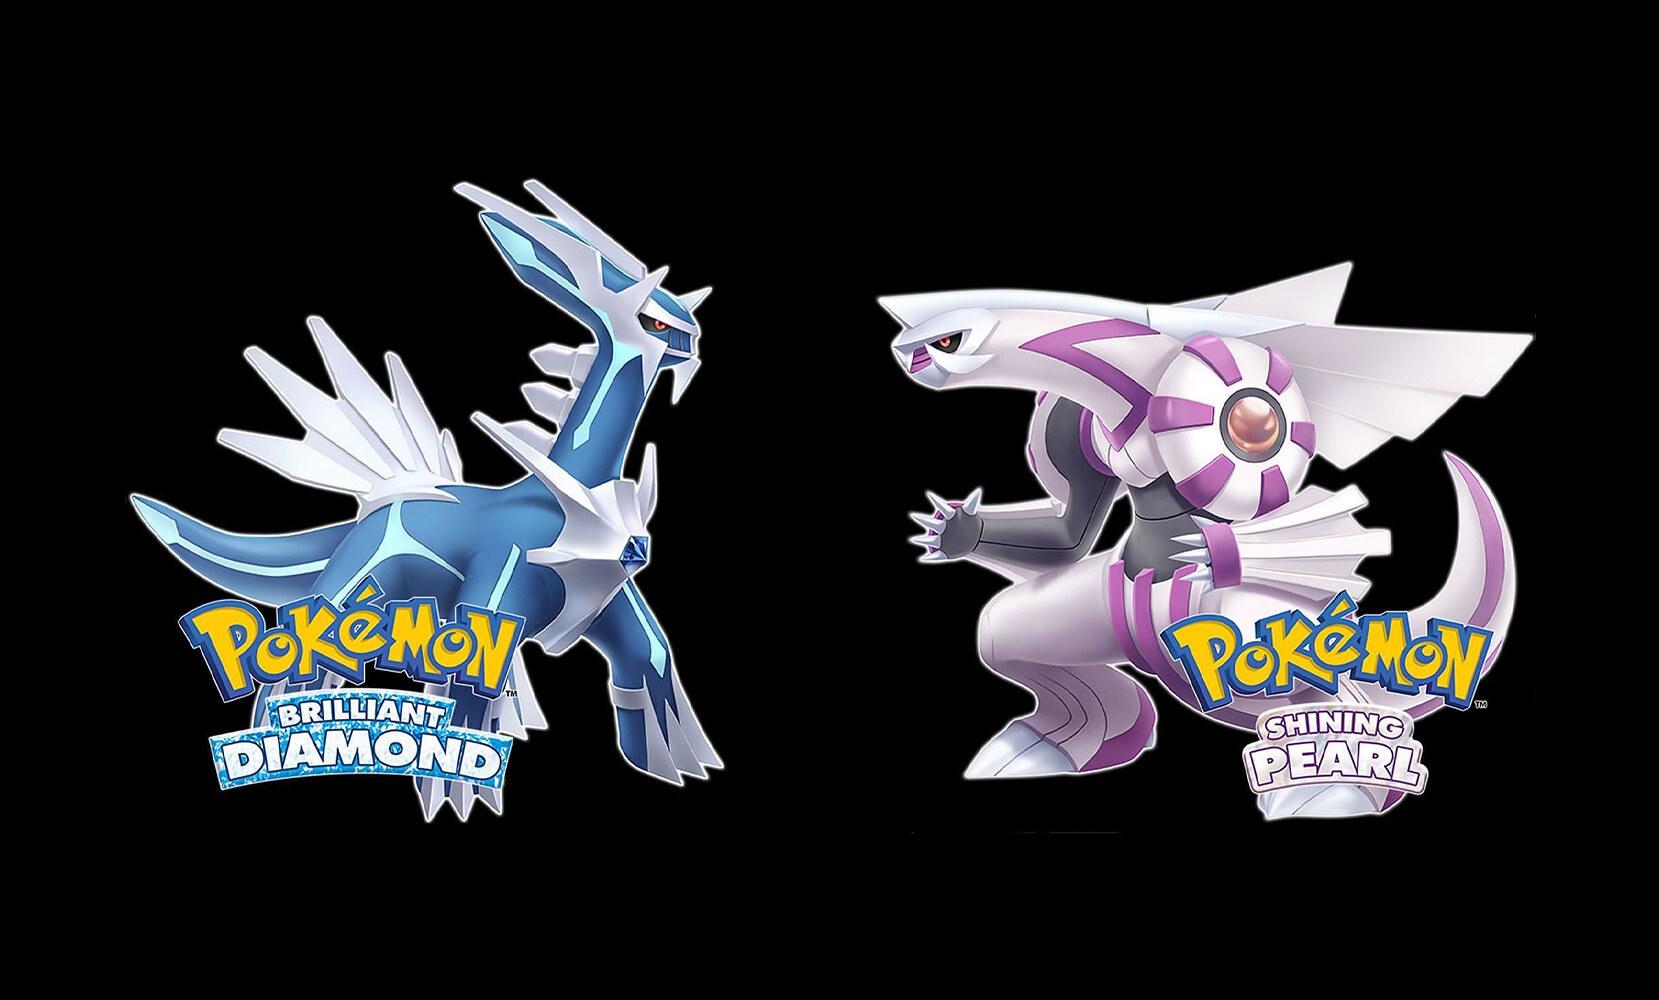 pokemon-shining-pearl-brilliant-diamond